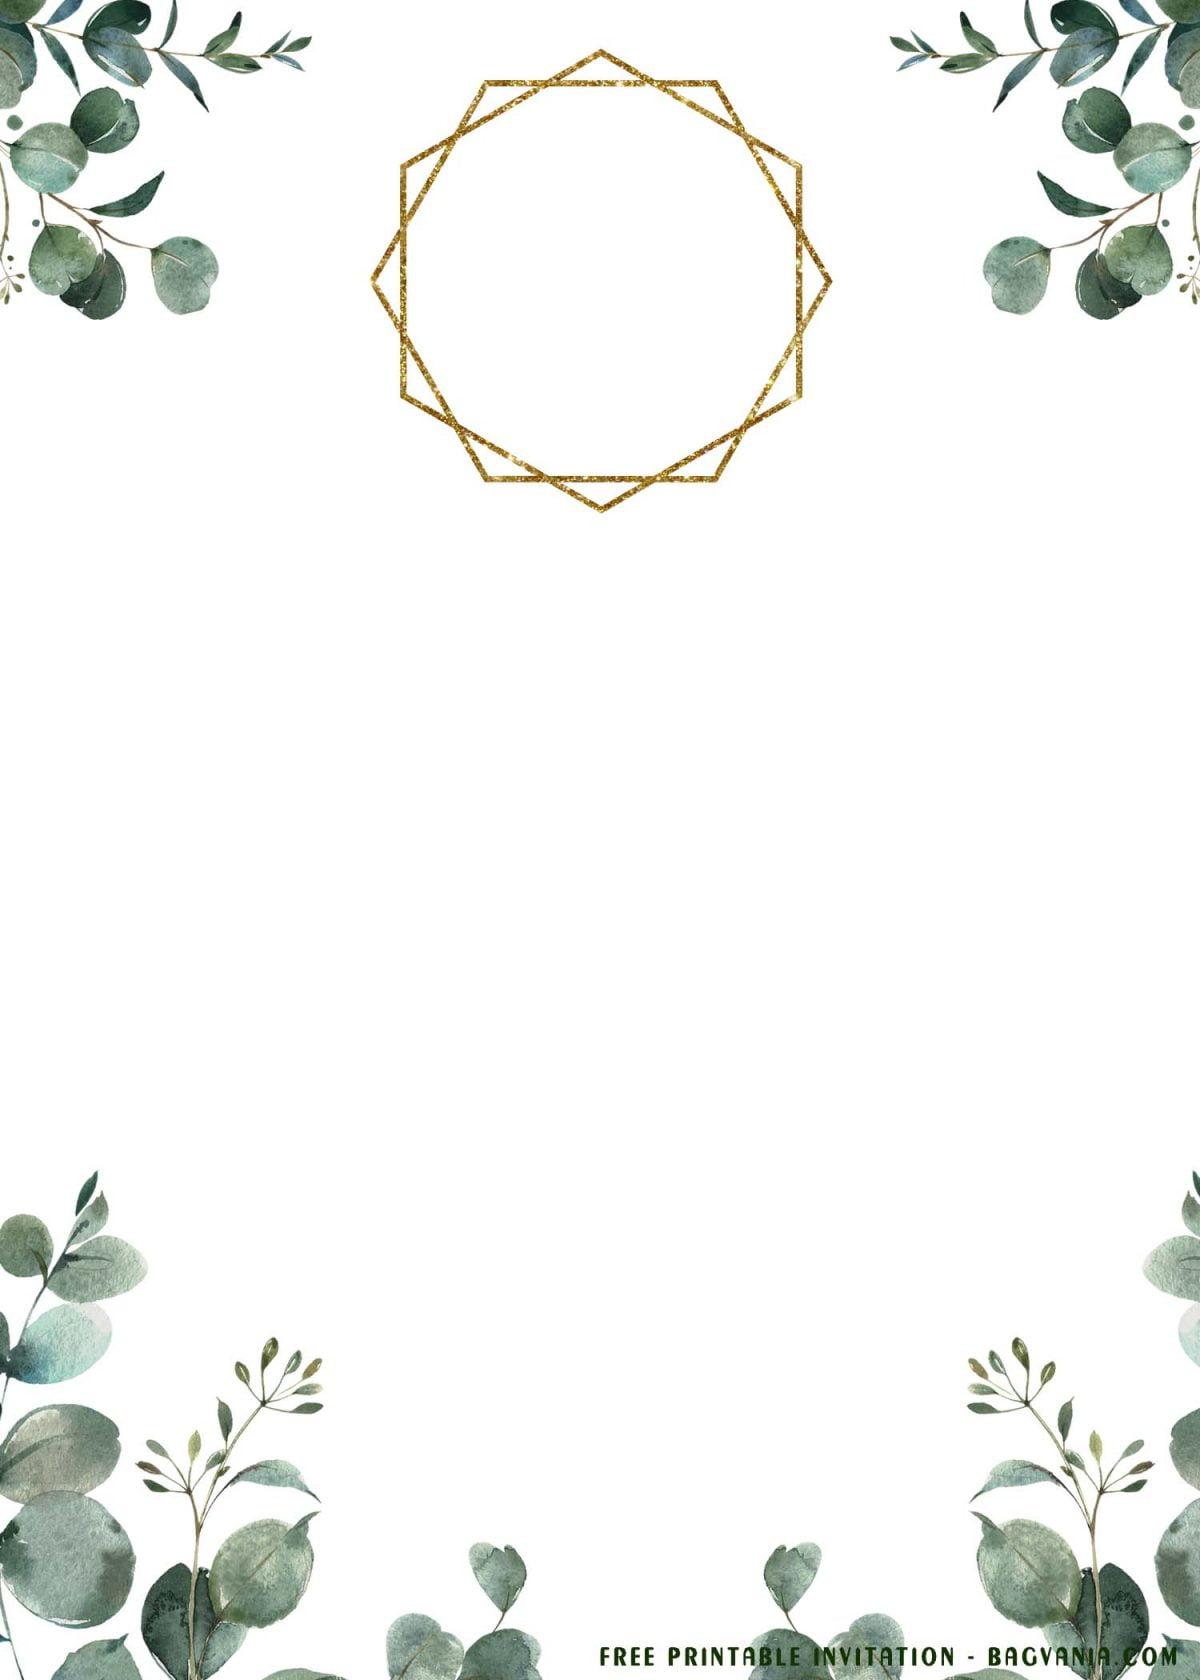 Free Printable Eucalyptus Wedding Invitation Templates With Geometric Style Text Frame